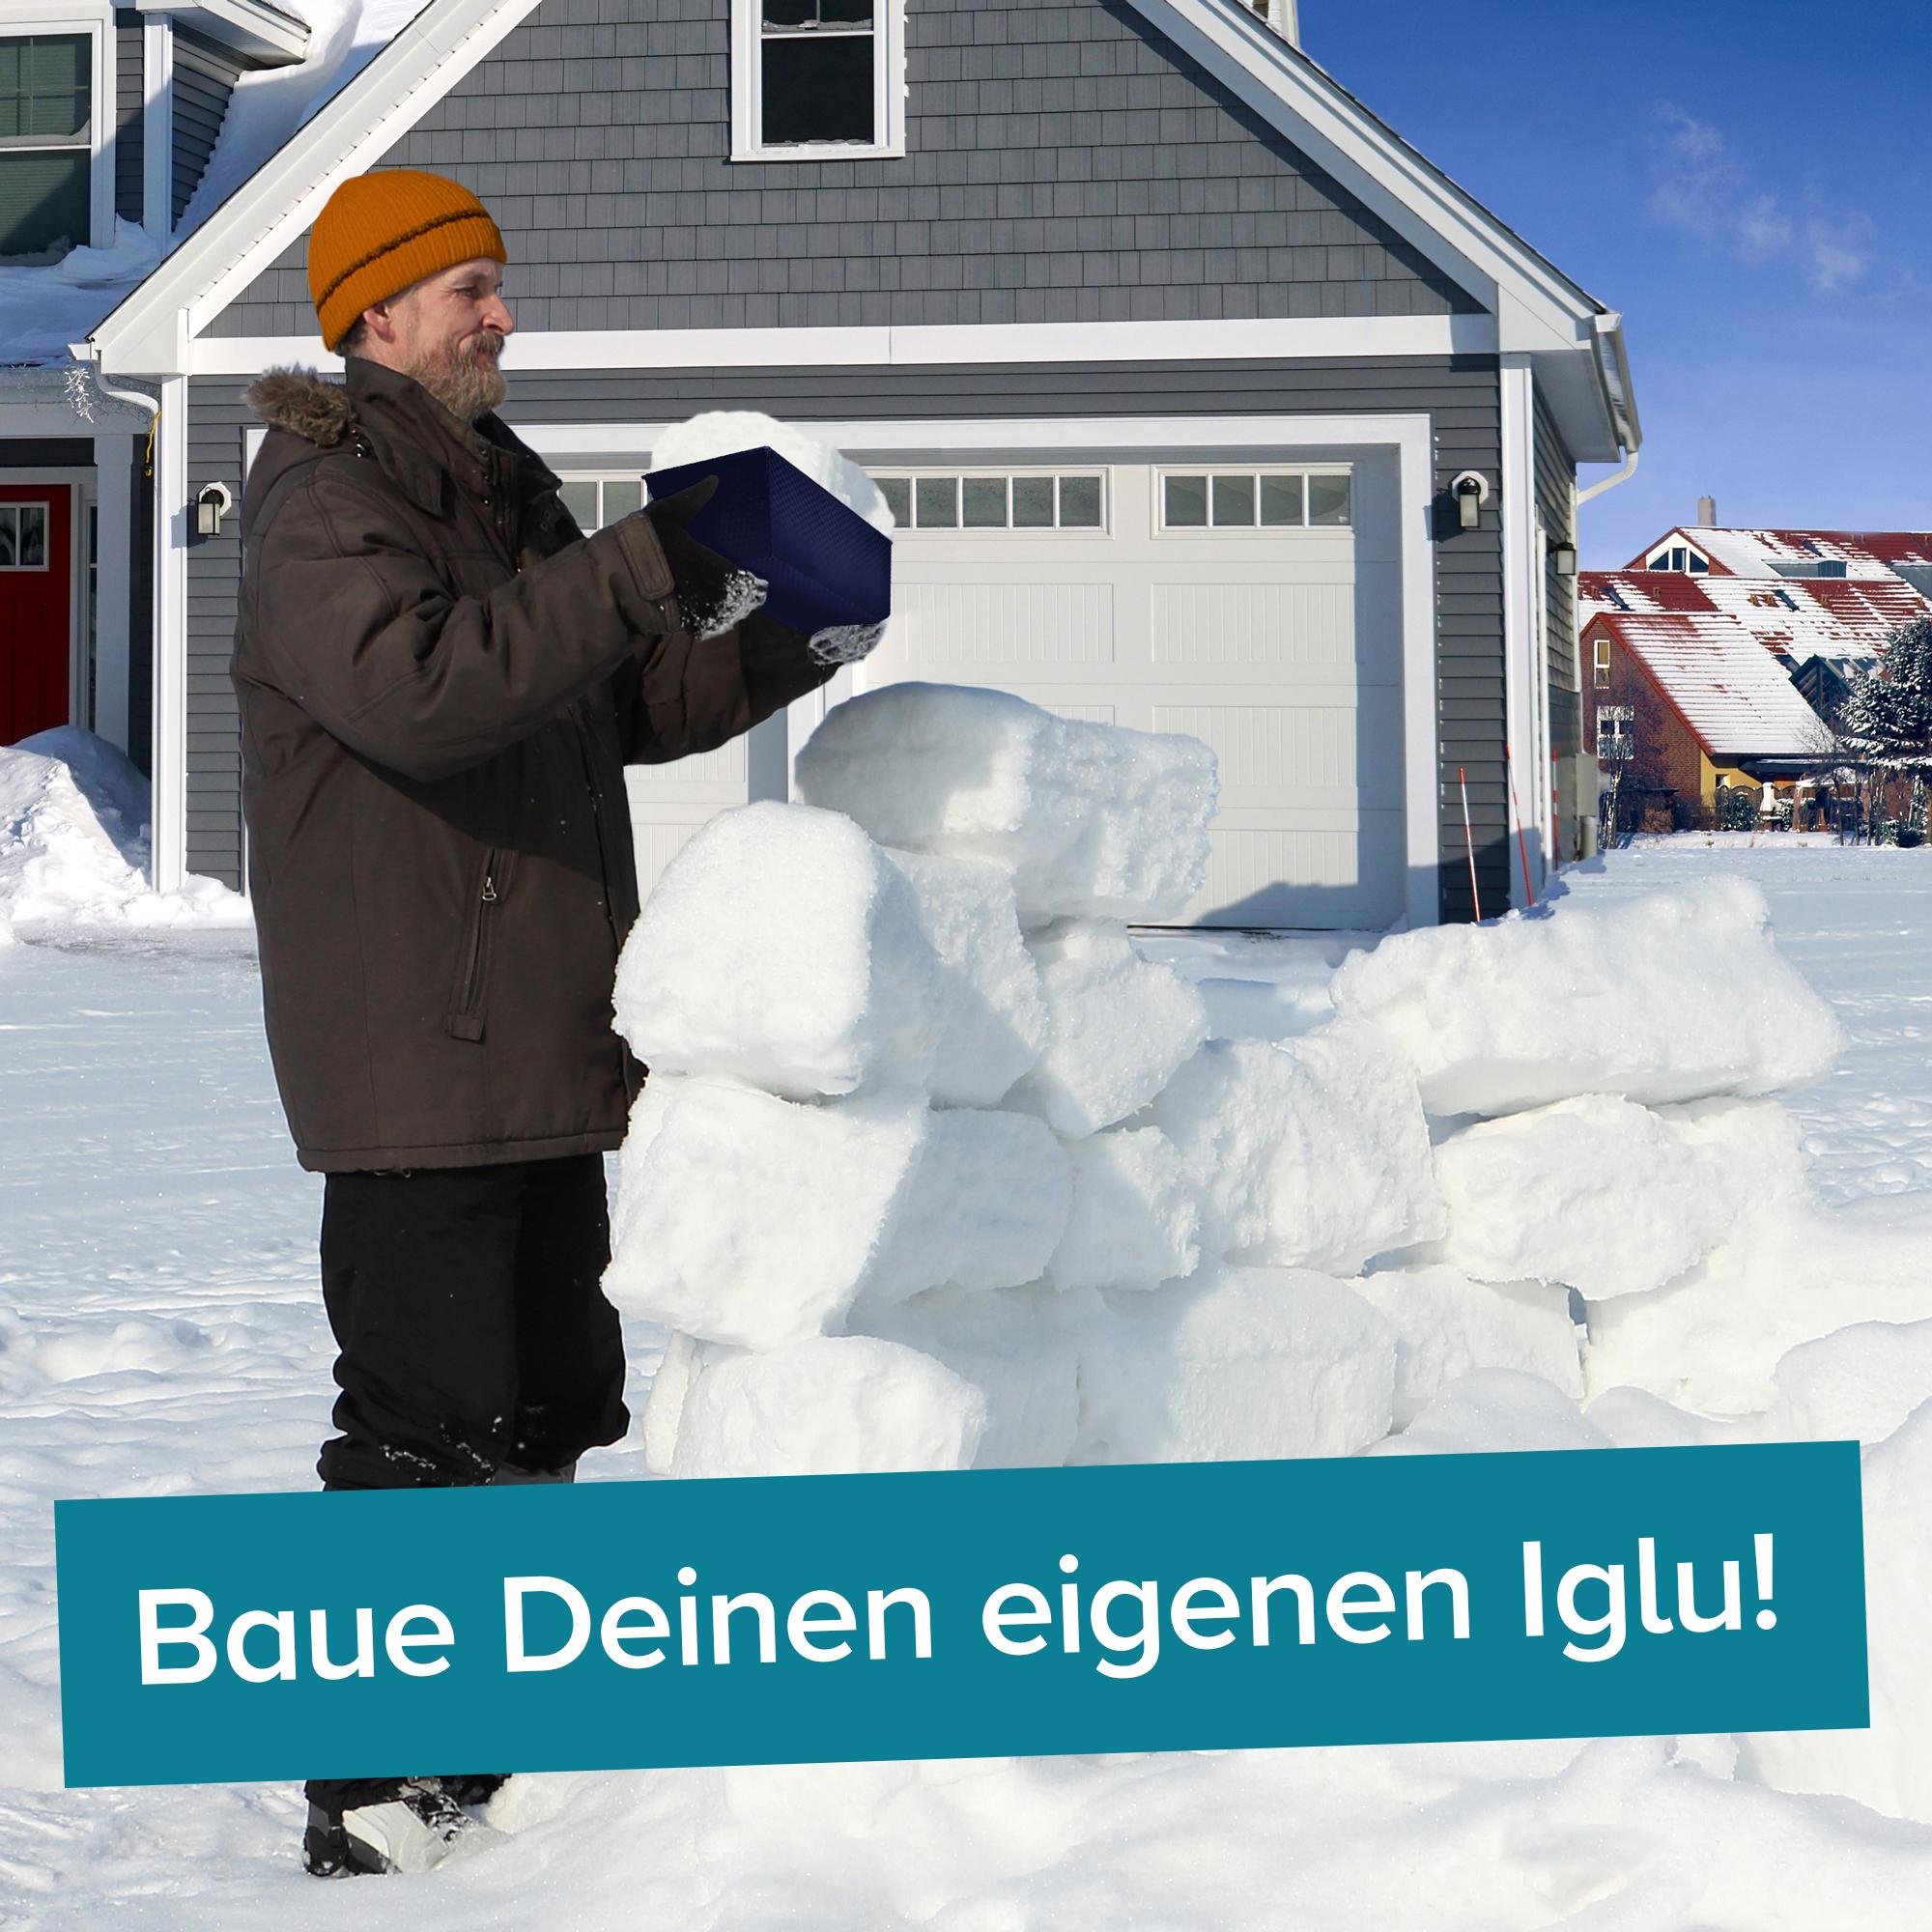 Iglu Bausatz für zuhause - Igloo yourself - 6